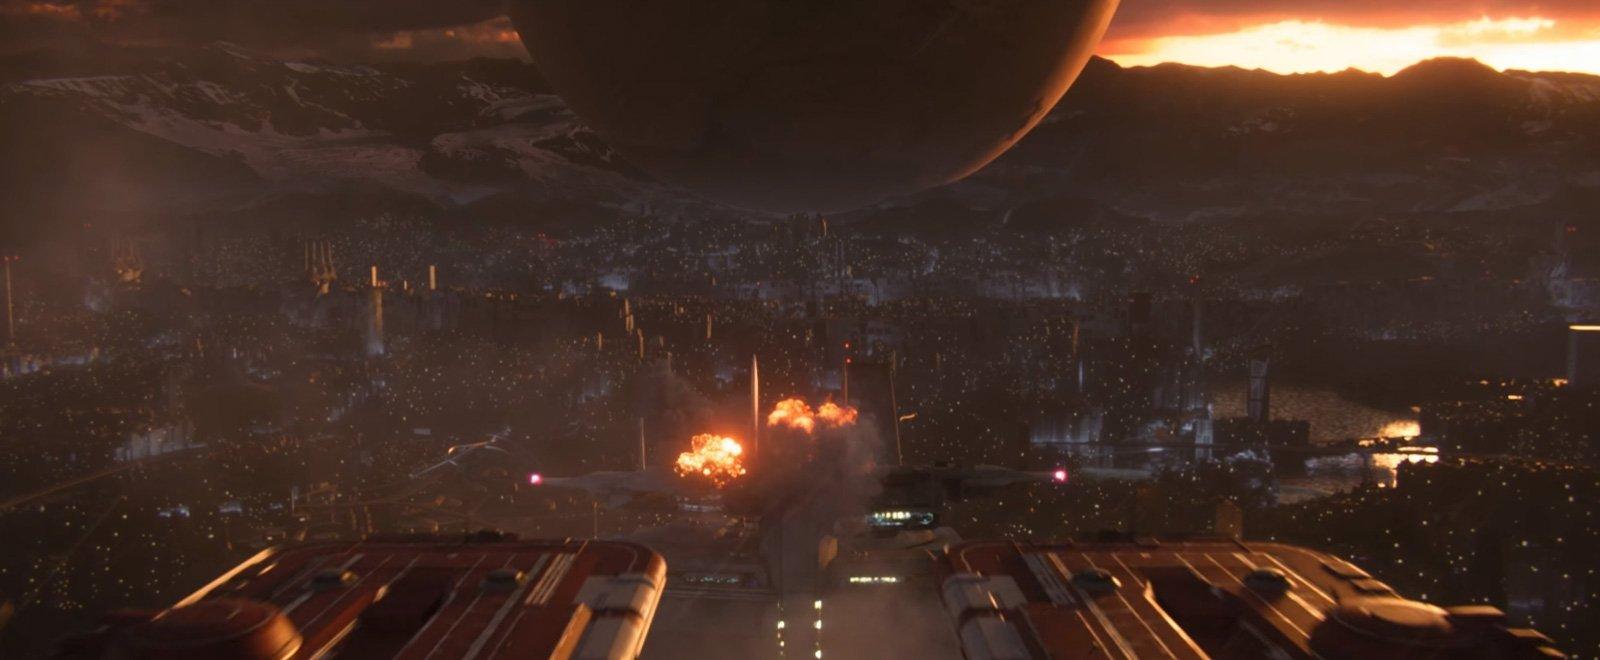 Destiny 2 Screenshot 10